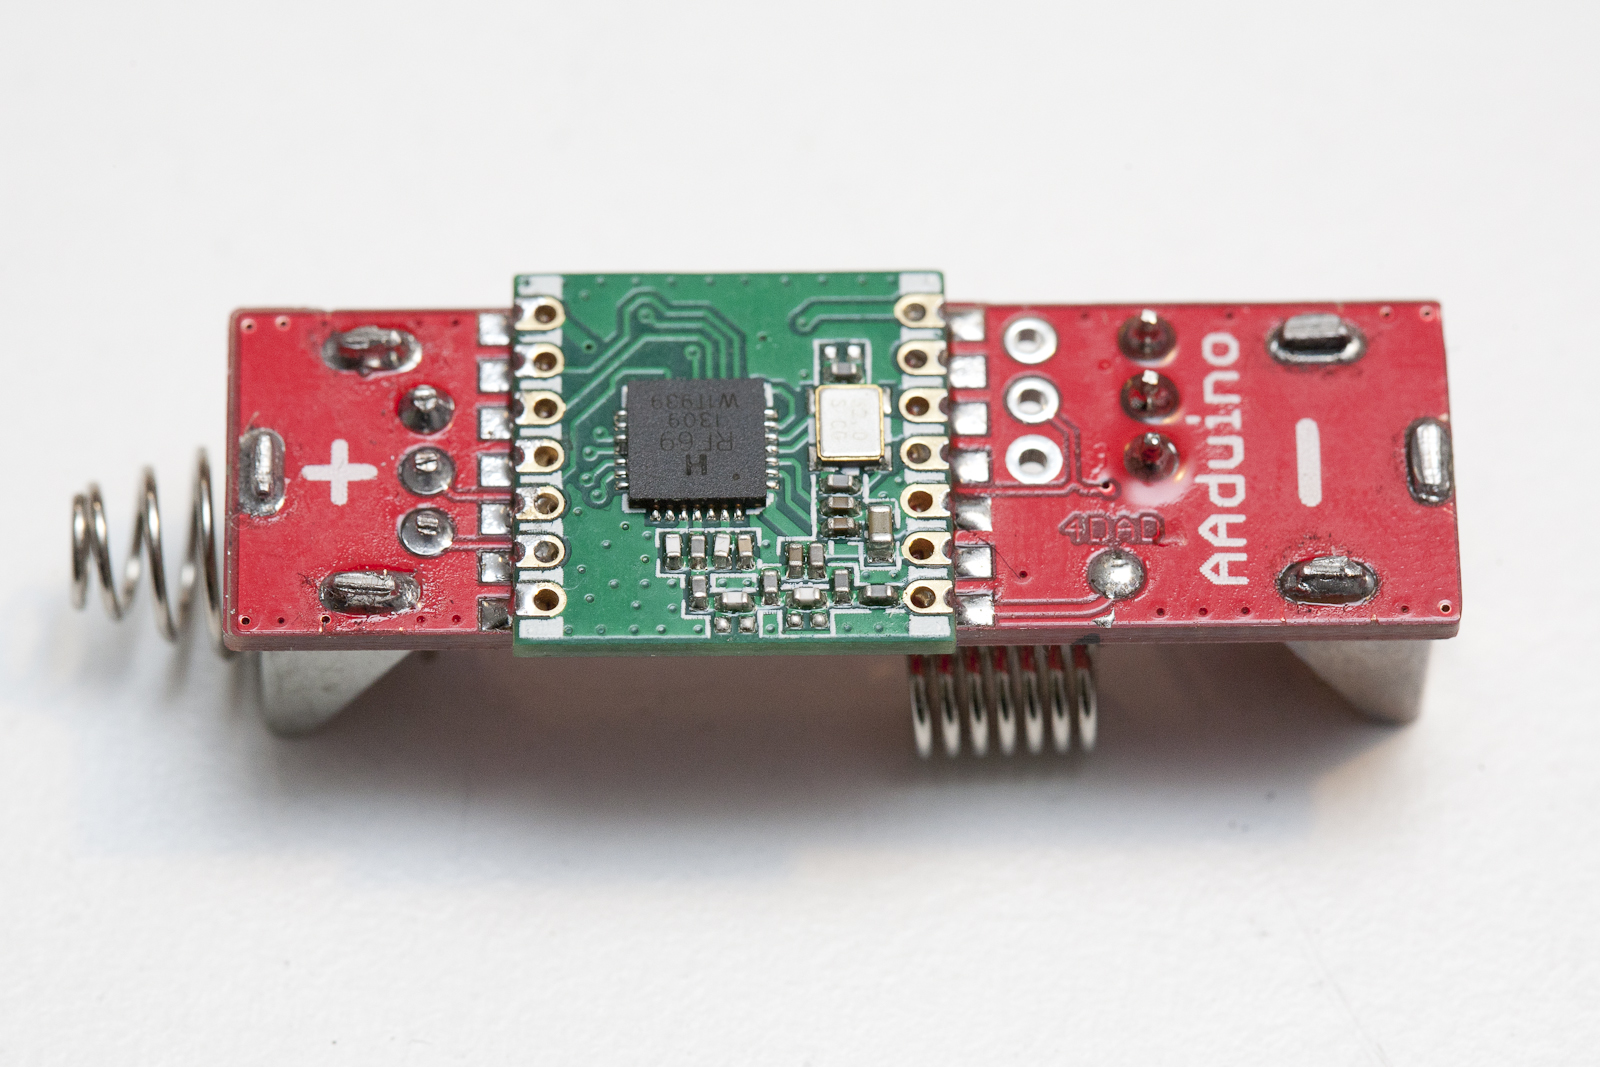 The Aaduino Johan Kanflo Electronicsdiycomcircuit And Rf Thief Rfm69c Side